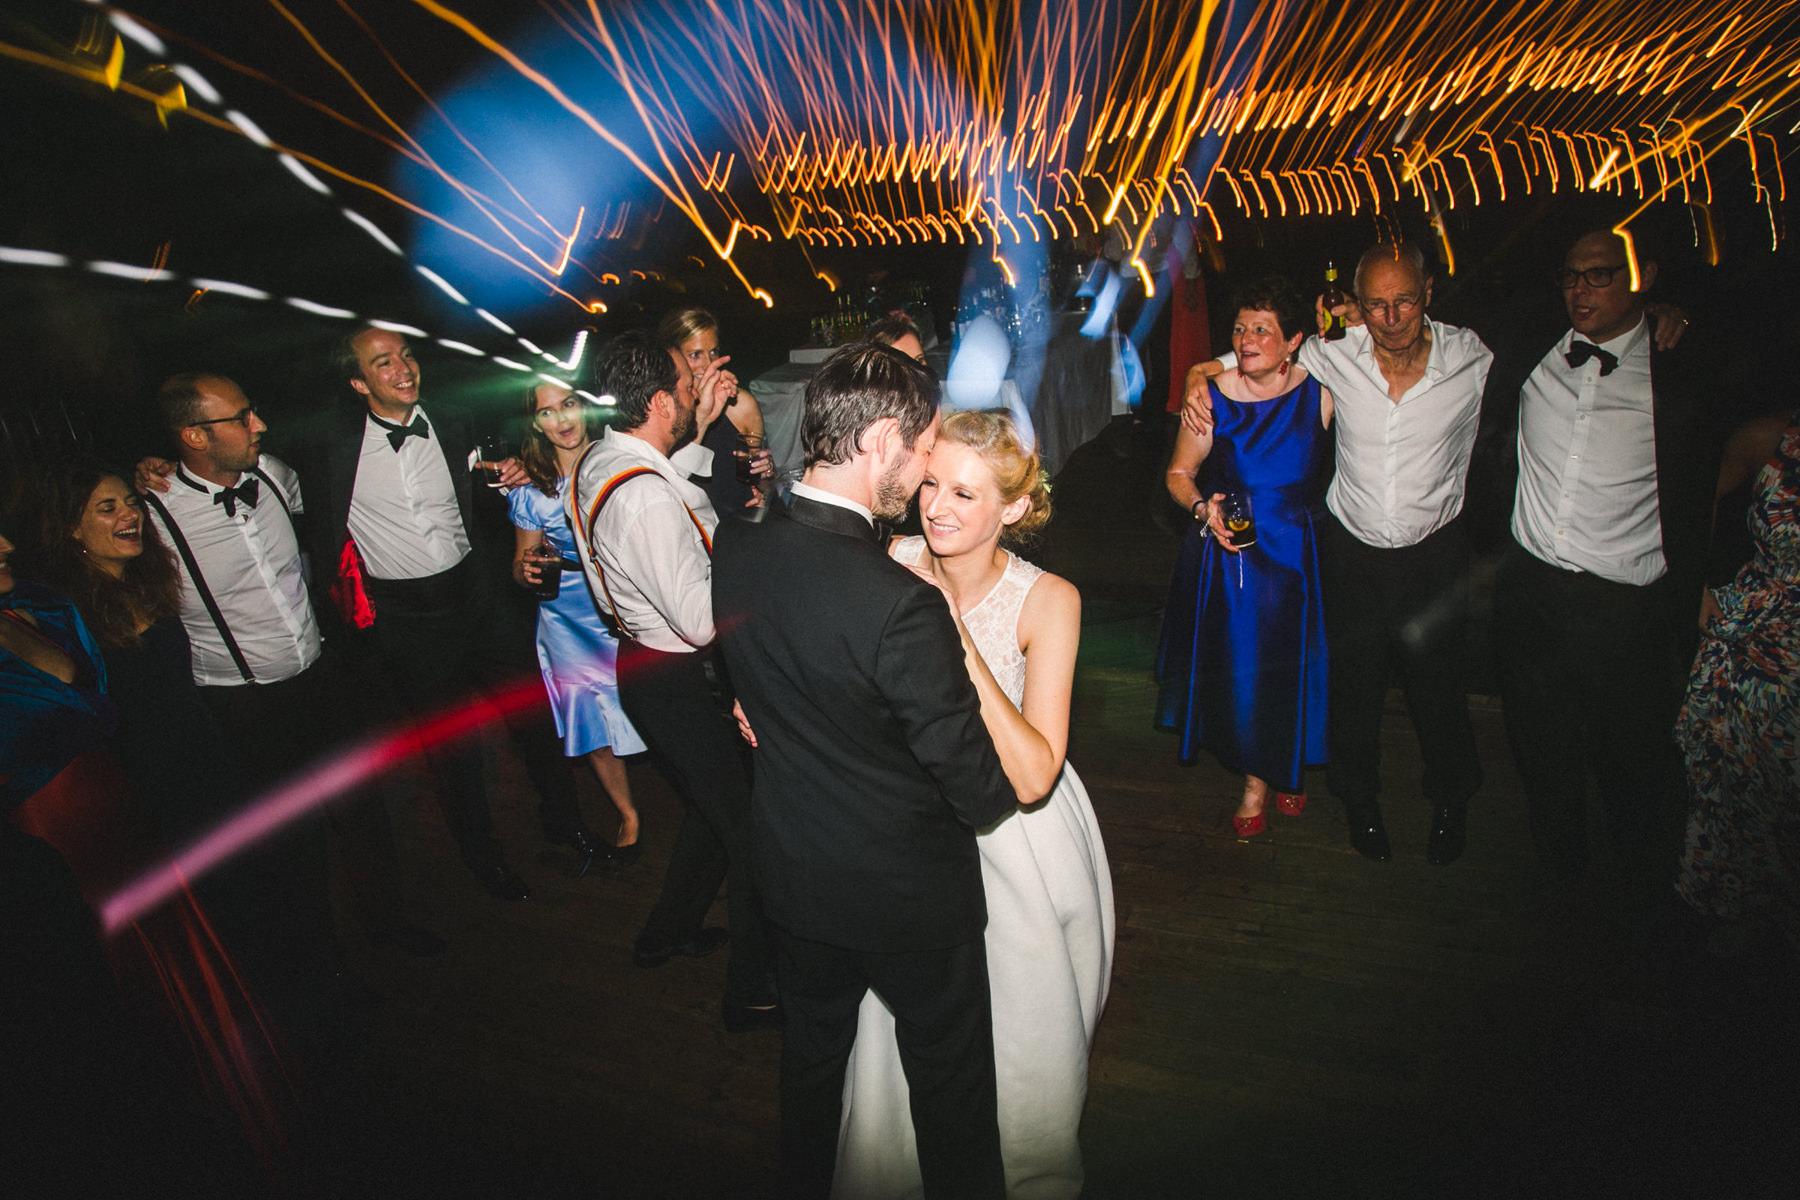 Wedding_Photography_Carlos_Hevia_Barcelona_Berlin_70.jpg